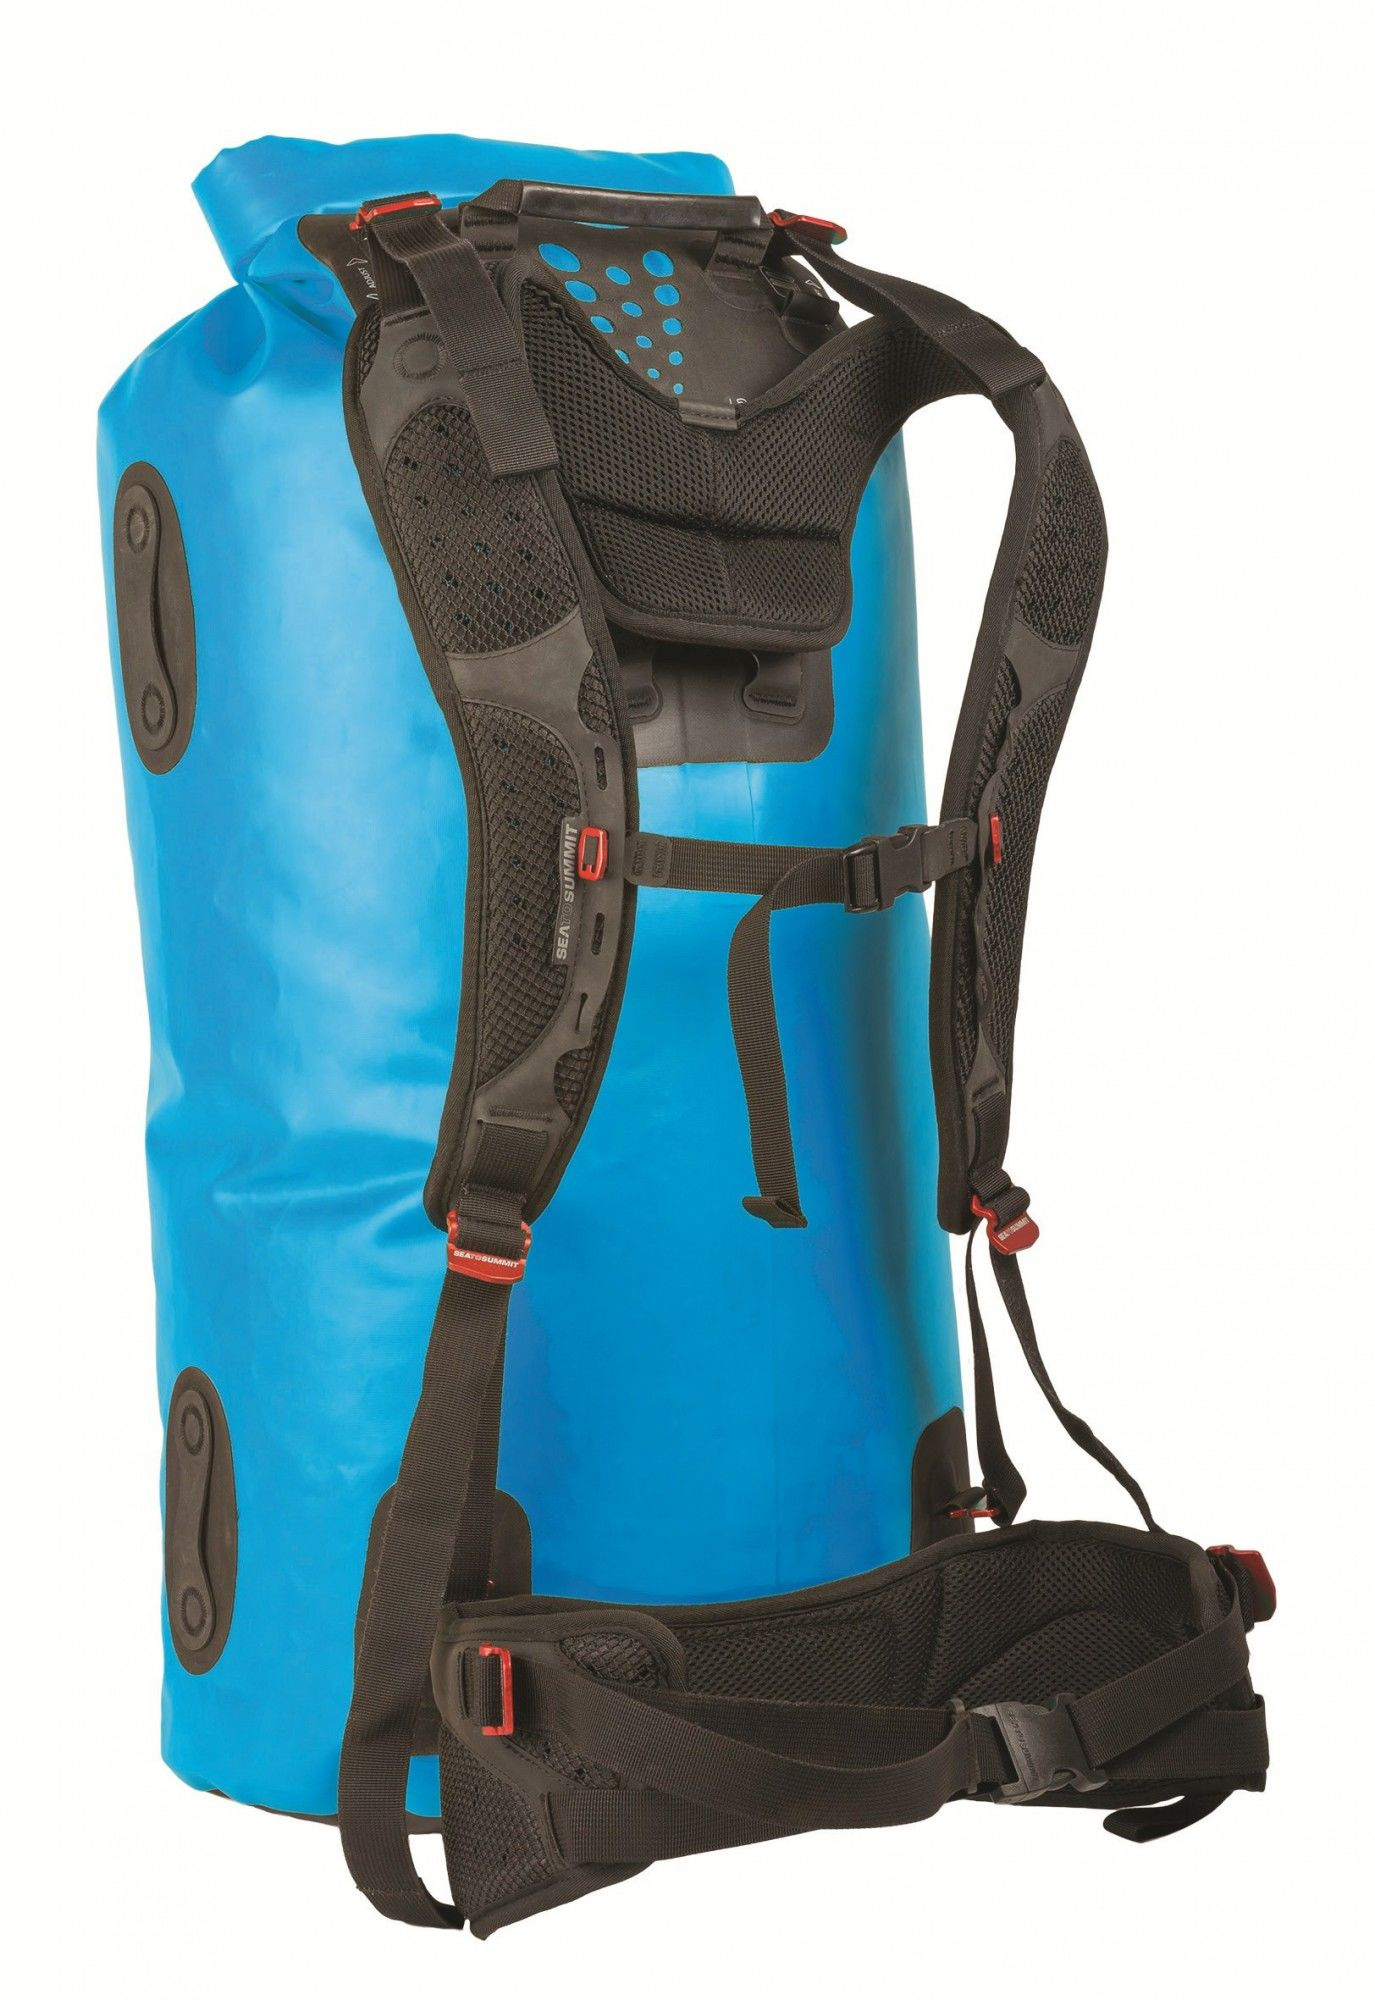 Sea to Summit Hydraulic Drypack 35L Blau, Taschen, 35l